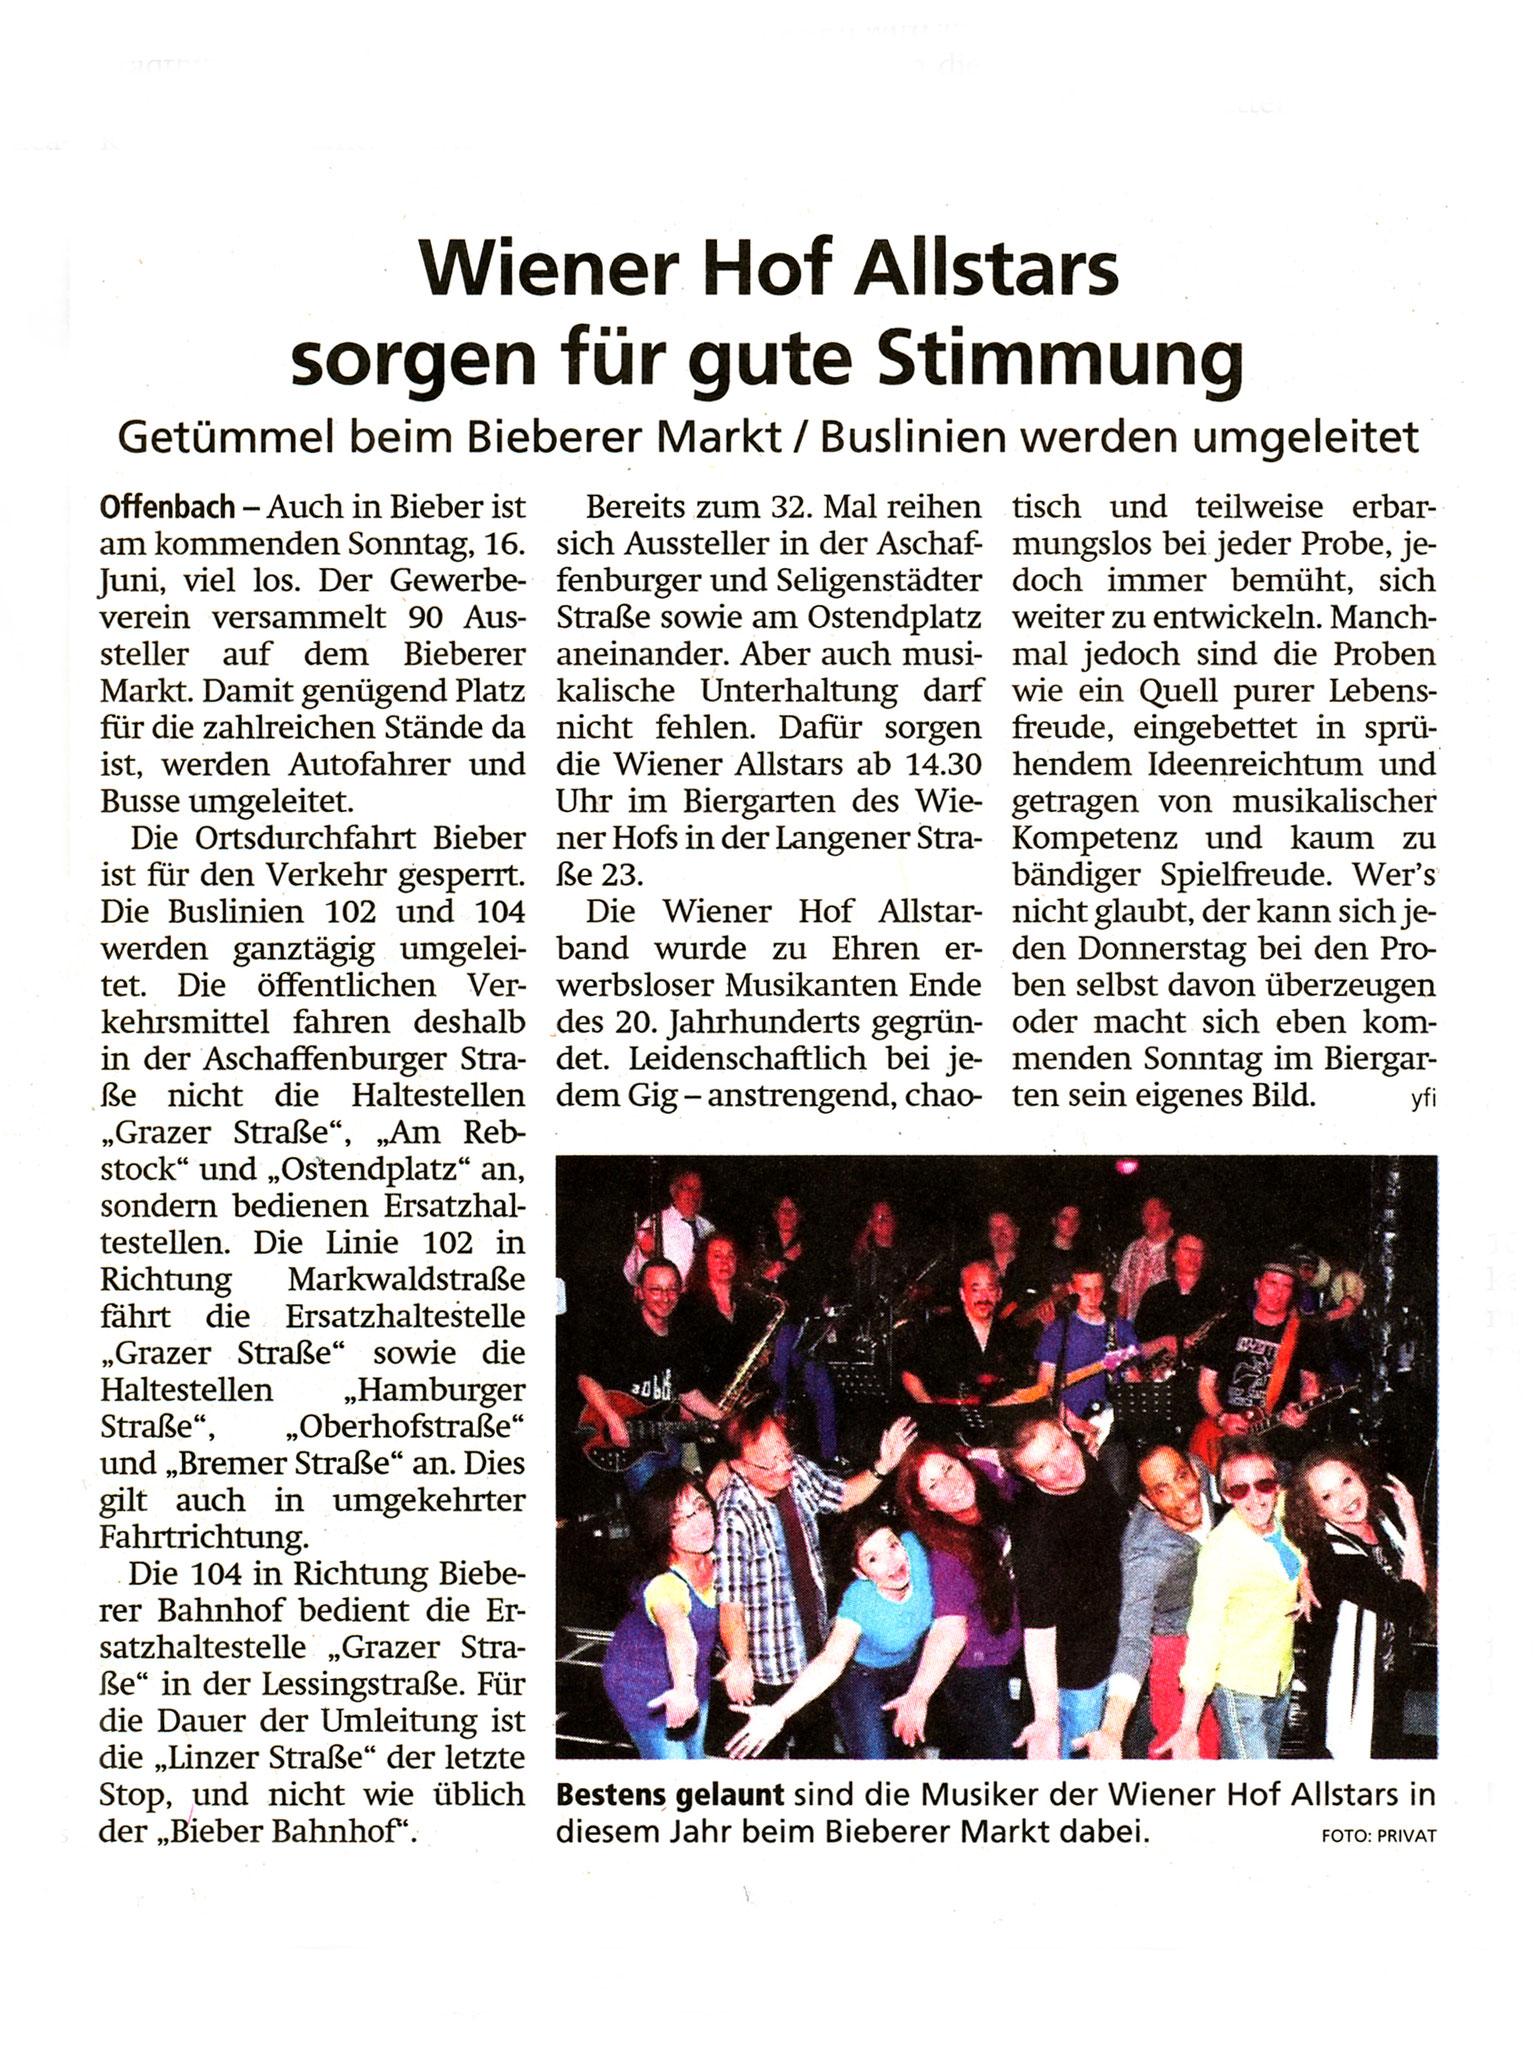 Offenbach Post, 14. Juni 2019